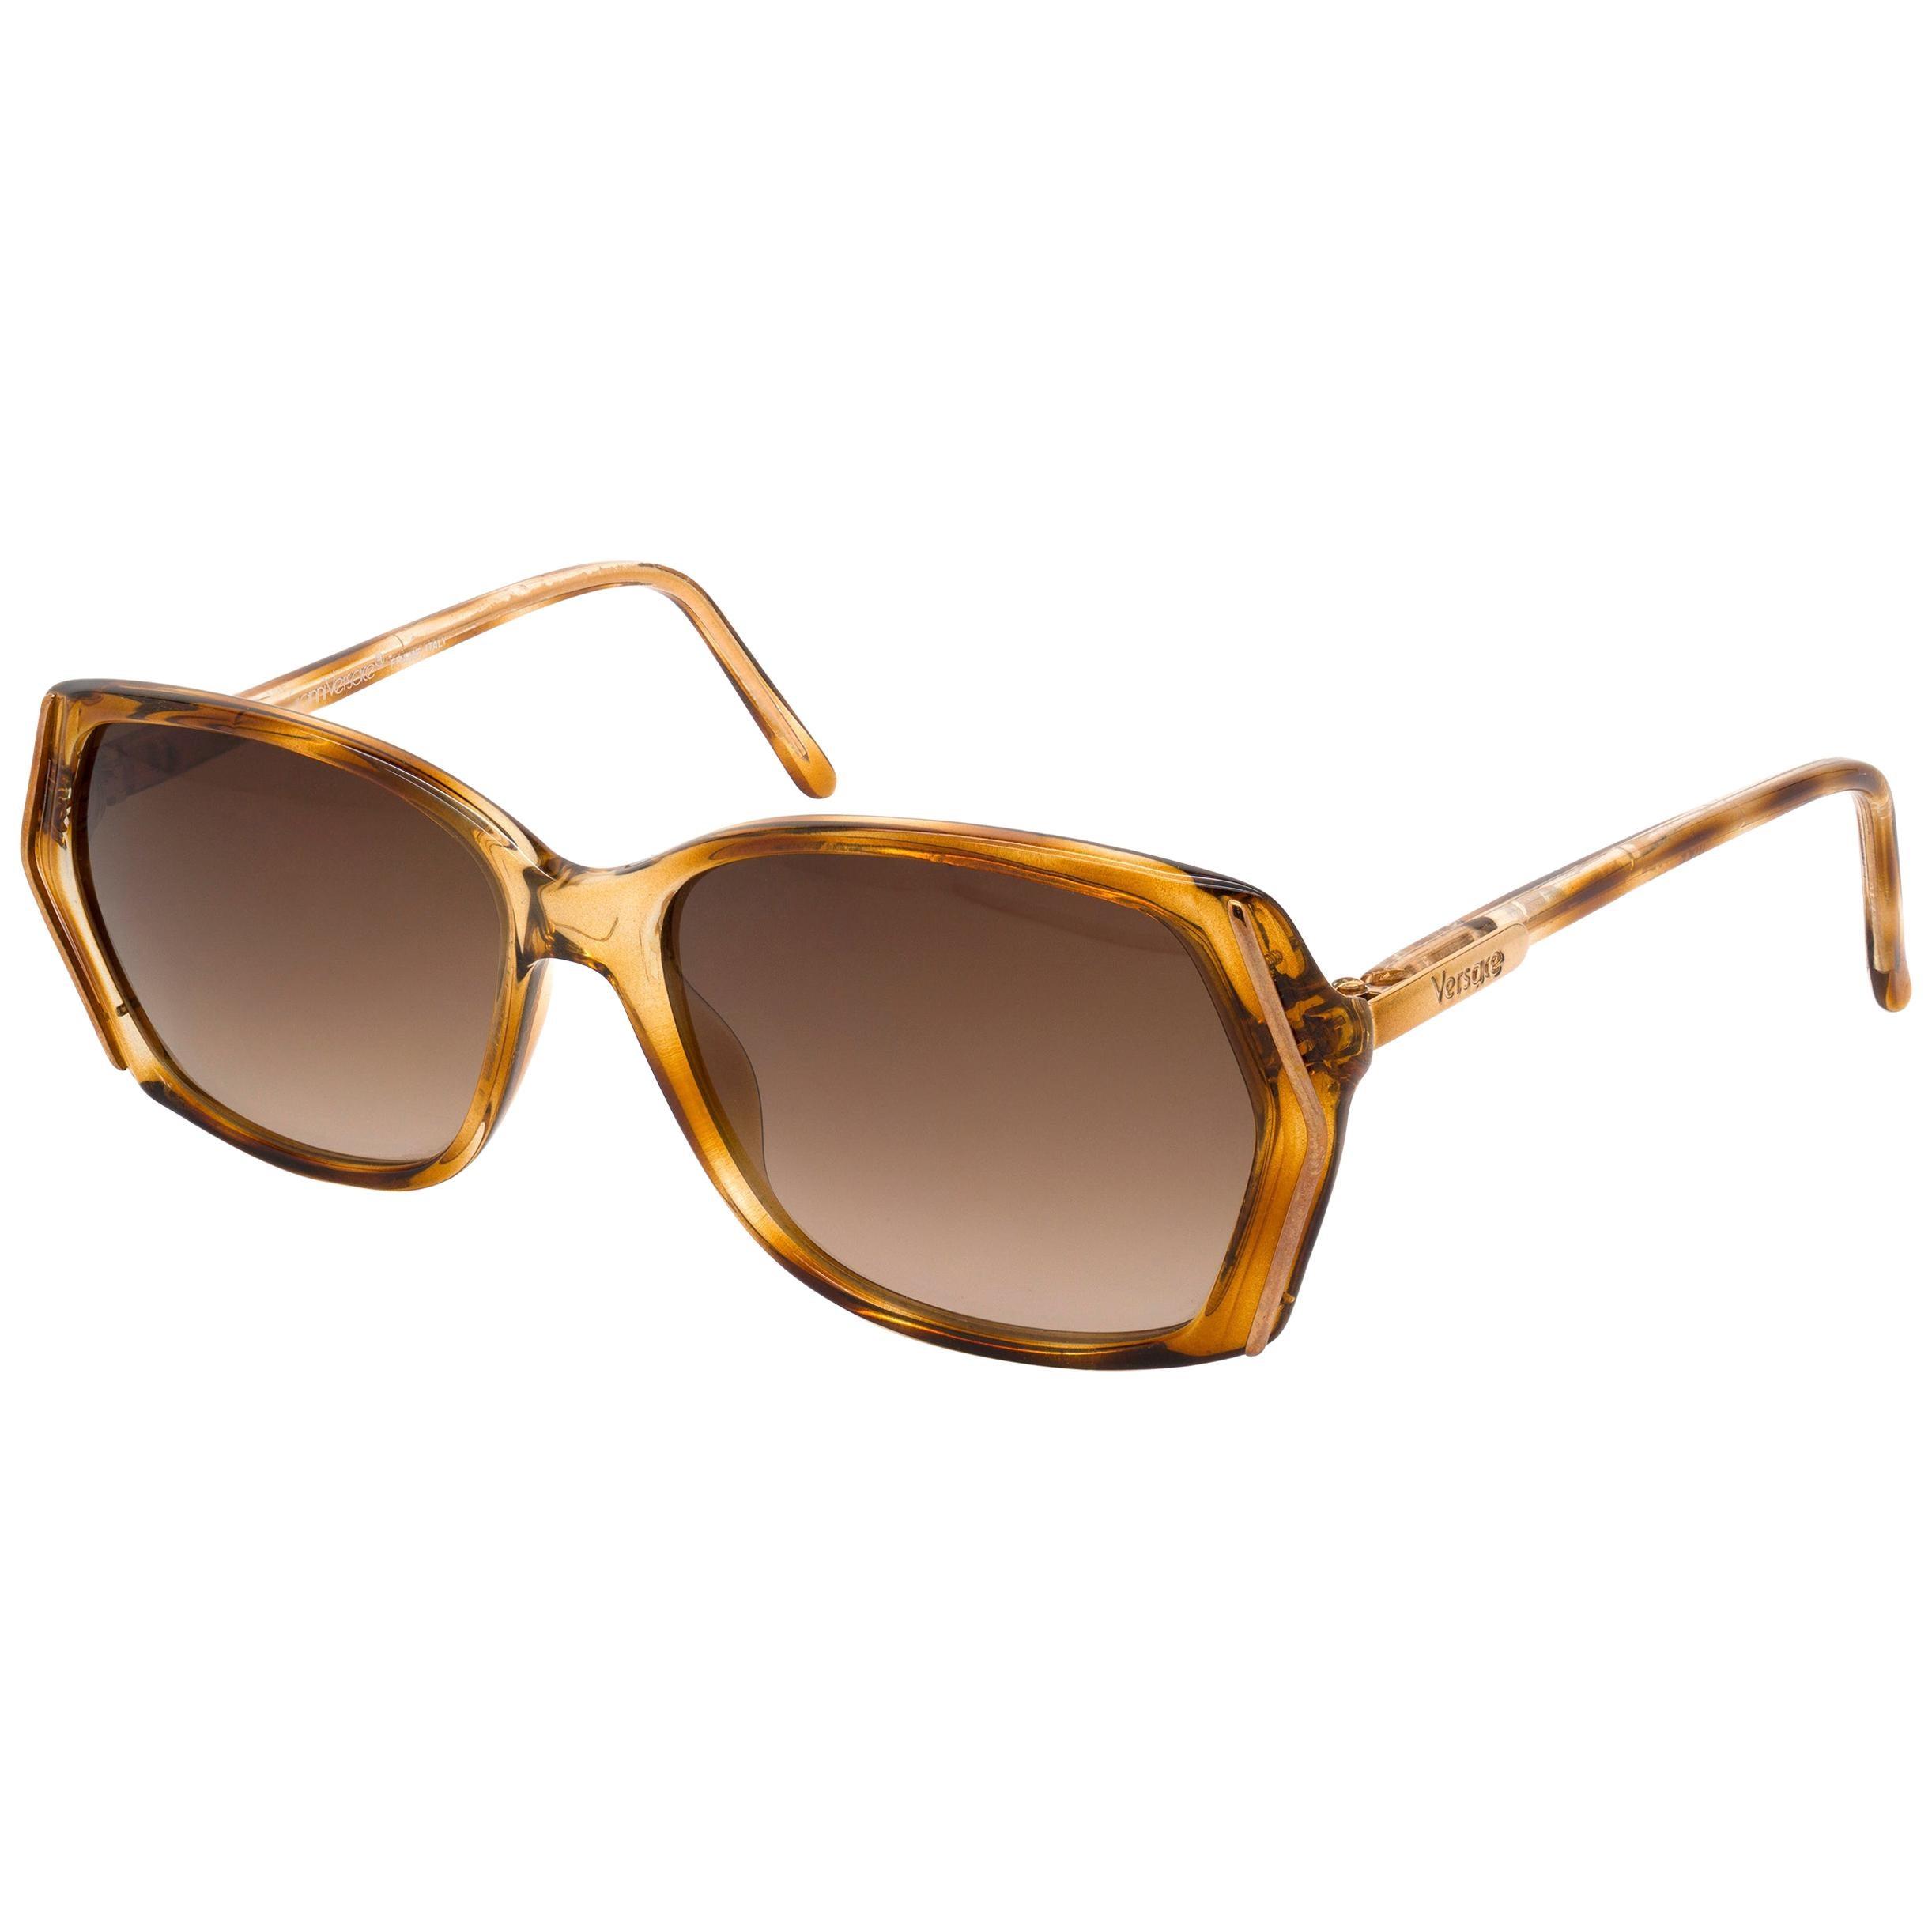 Versace vintage sunglasses 80s